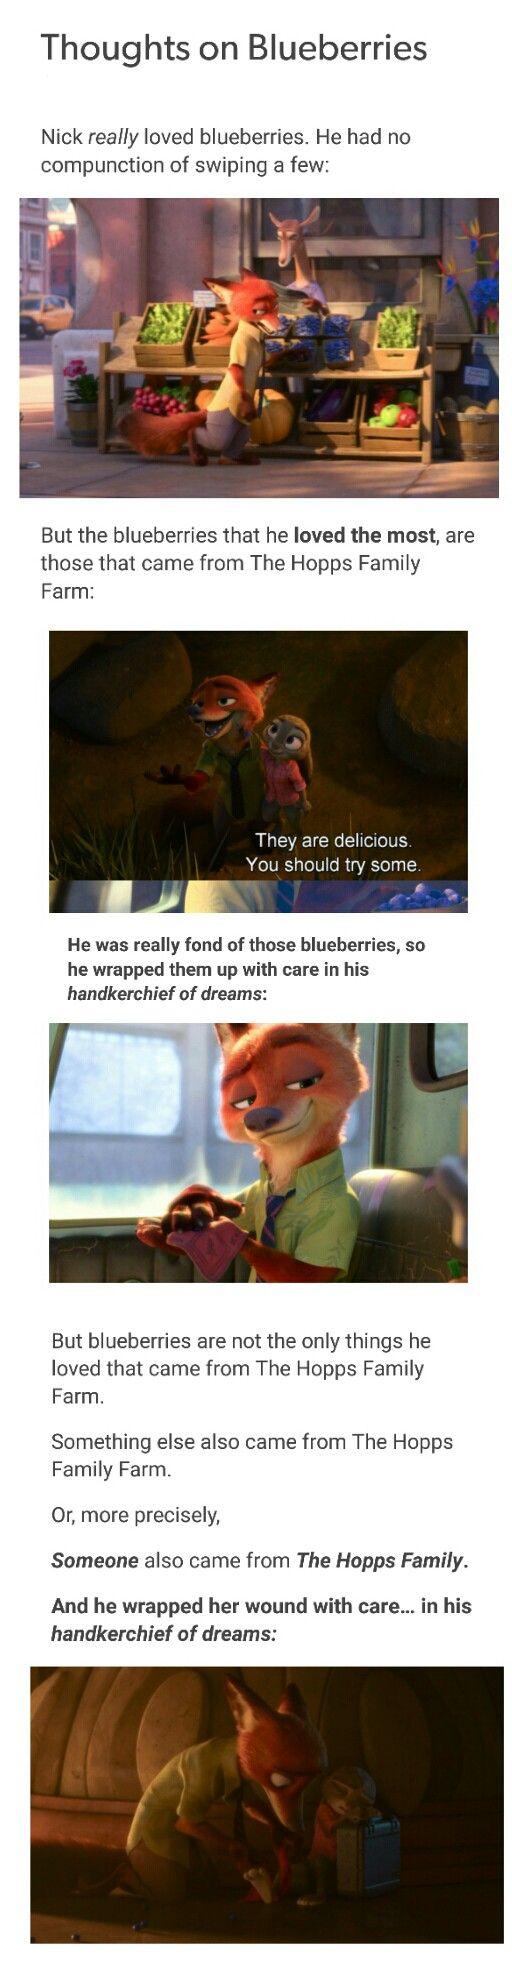 i don't really like the overreaching sense of logic but... it's cute, and i like cute :)